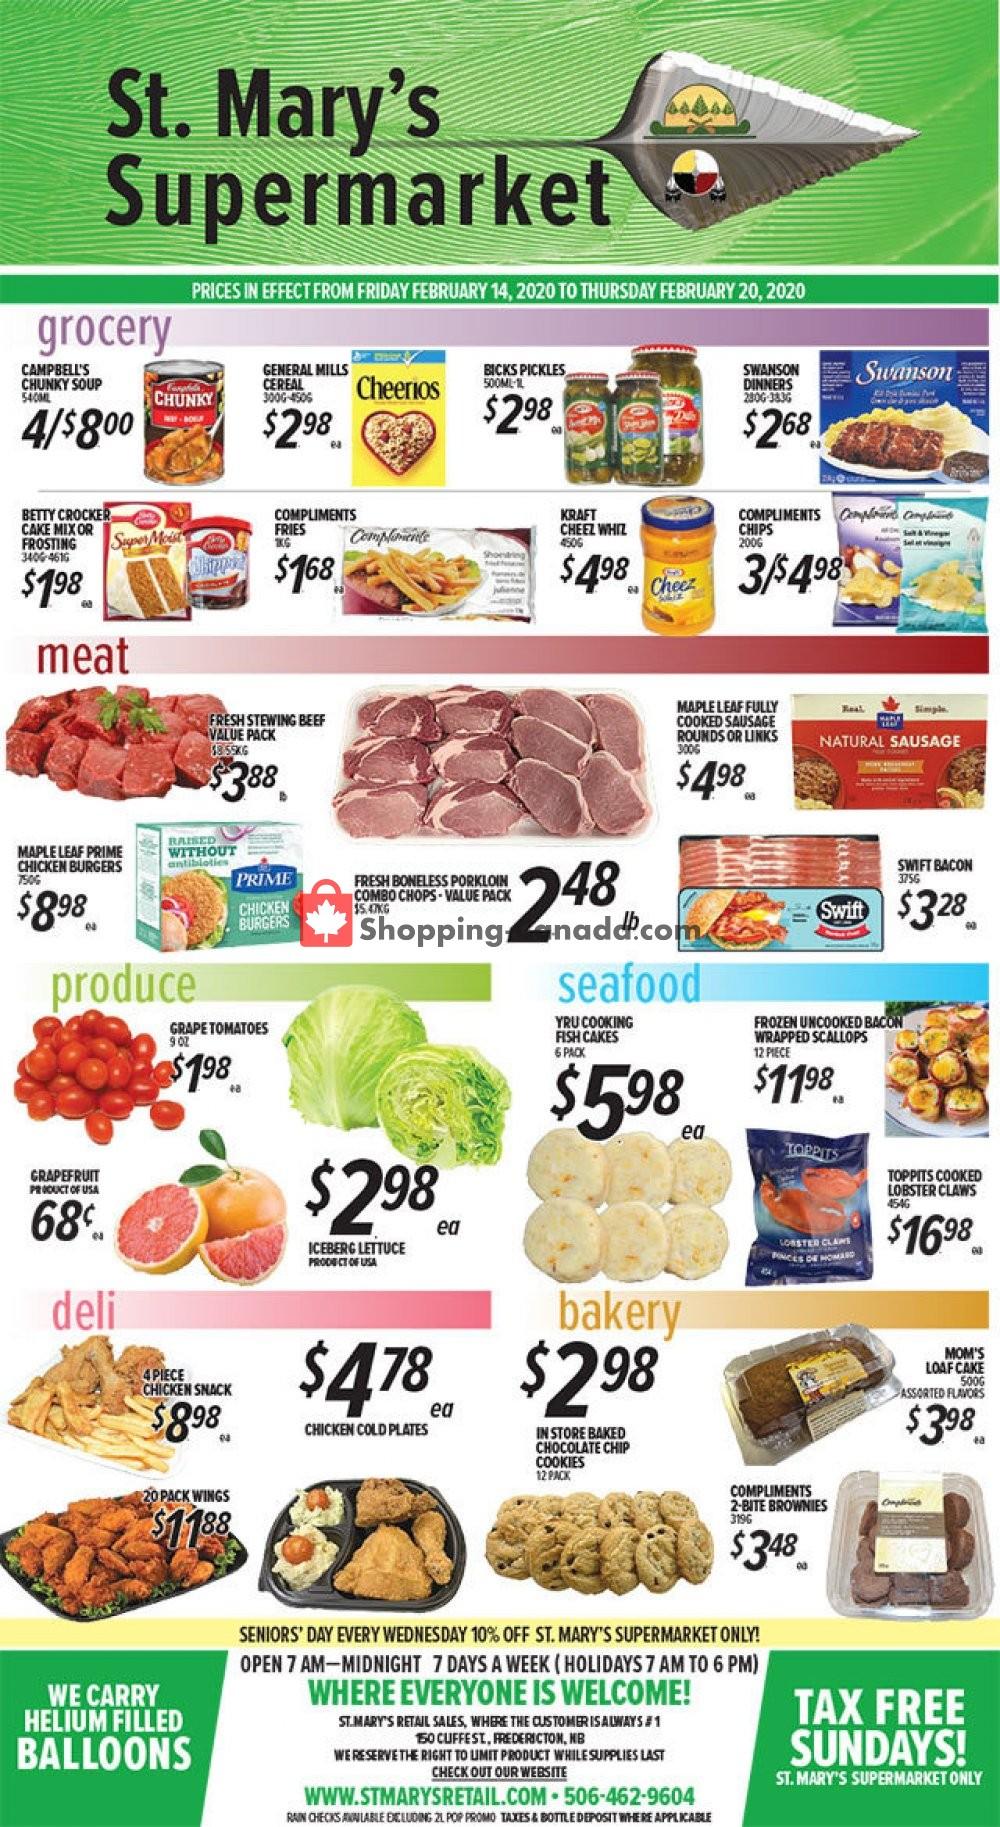 Flyer St. Mary's Supermarket Canada - from Friday February 14, 2020 to Thursday February 20, 2020